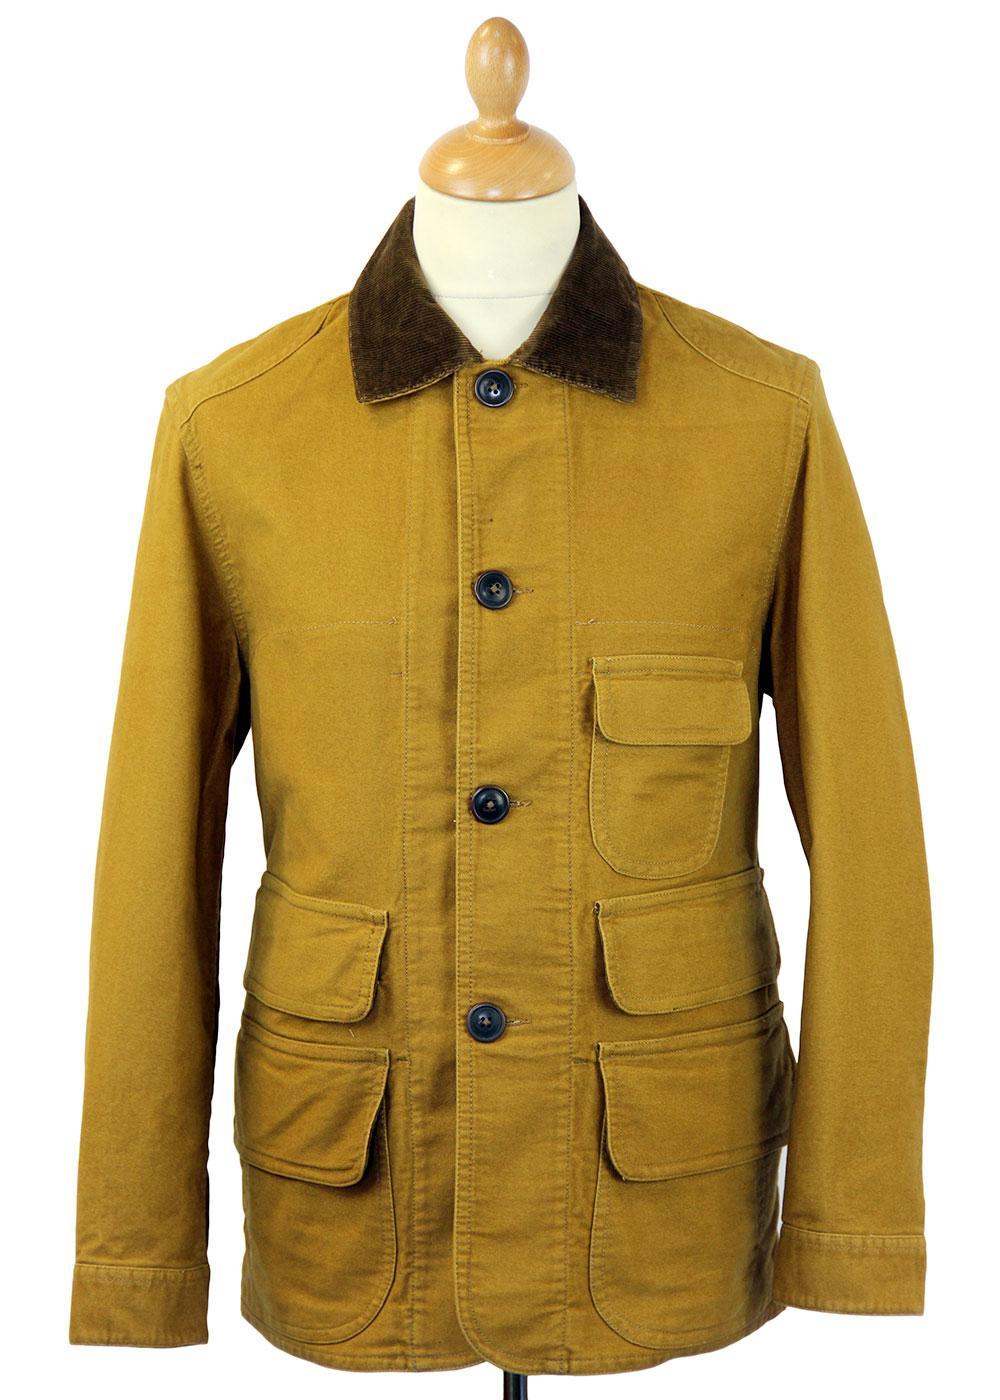 Brownsville Pendleton 50s Moleskin Hunting Jacket